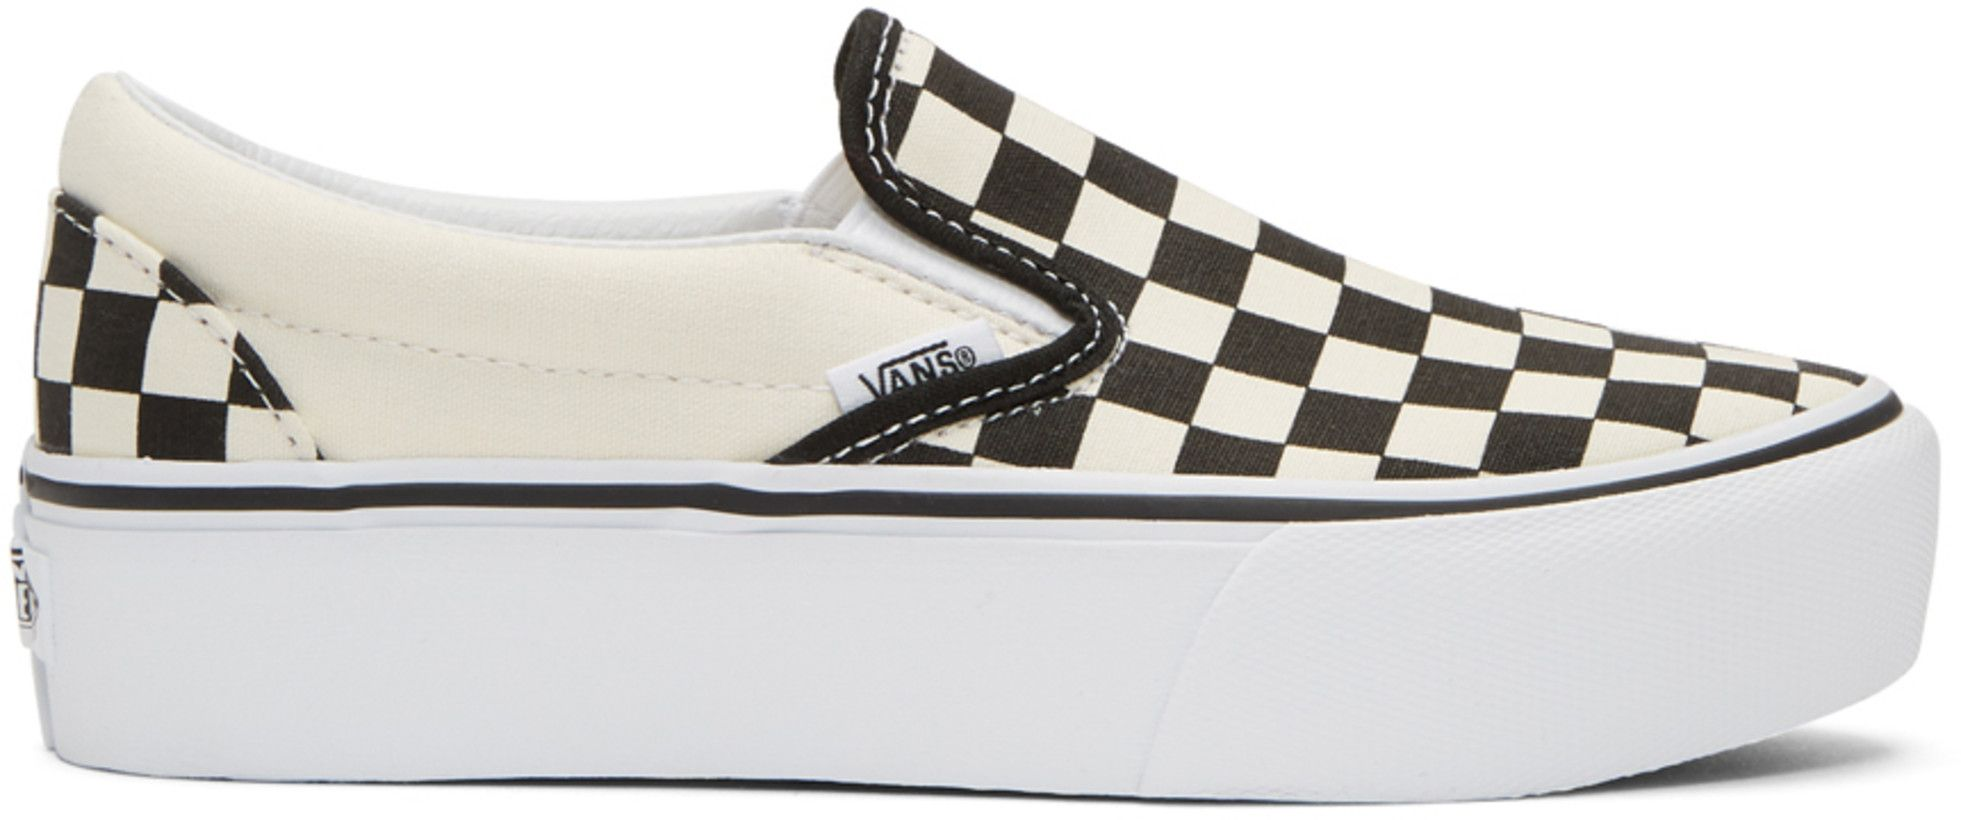 e51f3ff5d9 Vans - Off-White   Black Checkerboard Classic Slip-On Platform Sneakers